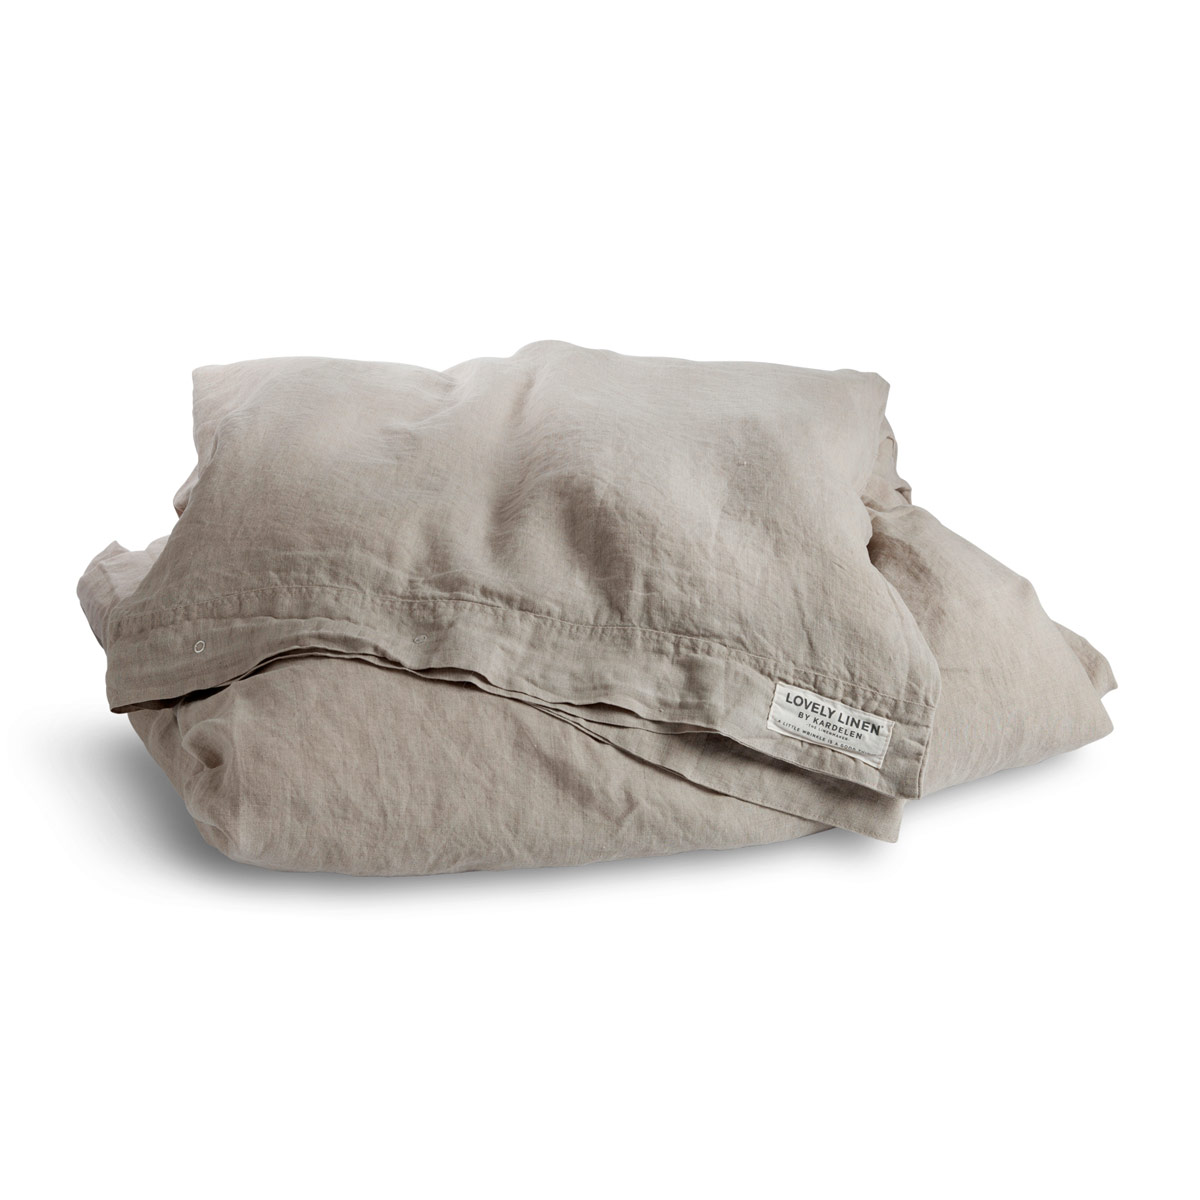 lovely linen bettdeckenbezug misty 190g m bettw sche aus leinen das beste der. Black Bedroom Furniture Sets. Home Design Ideas